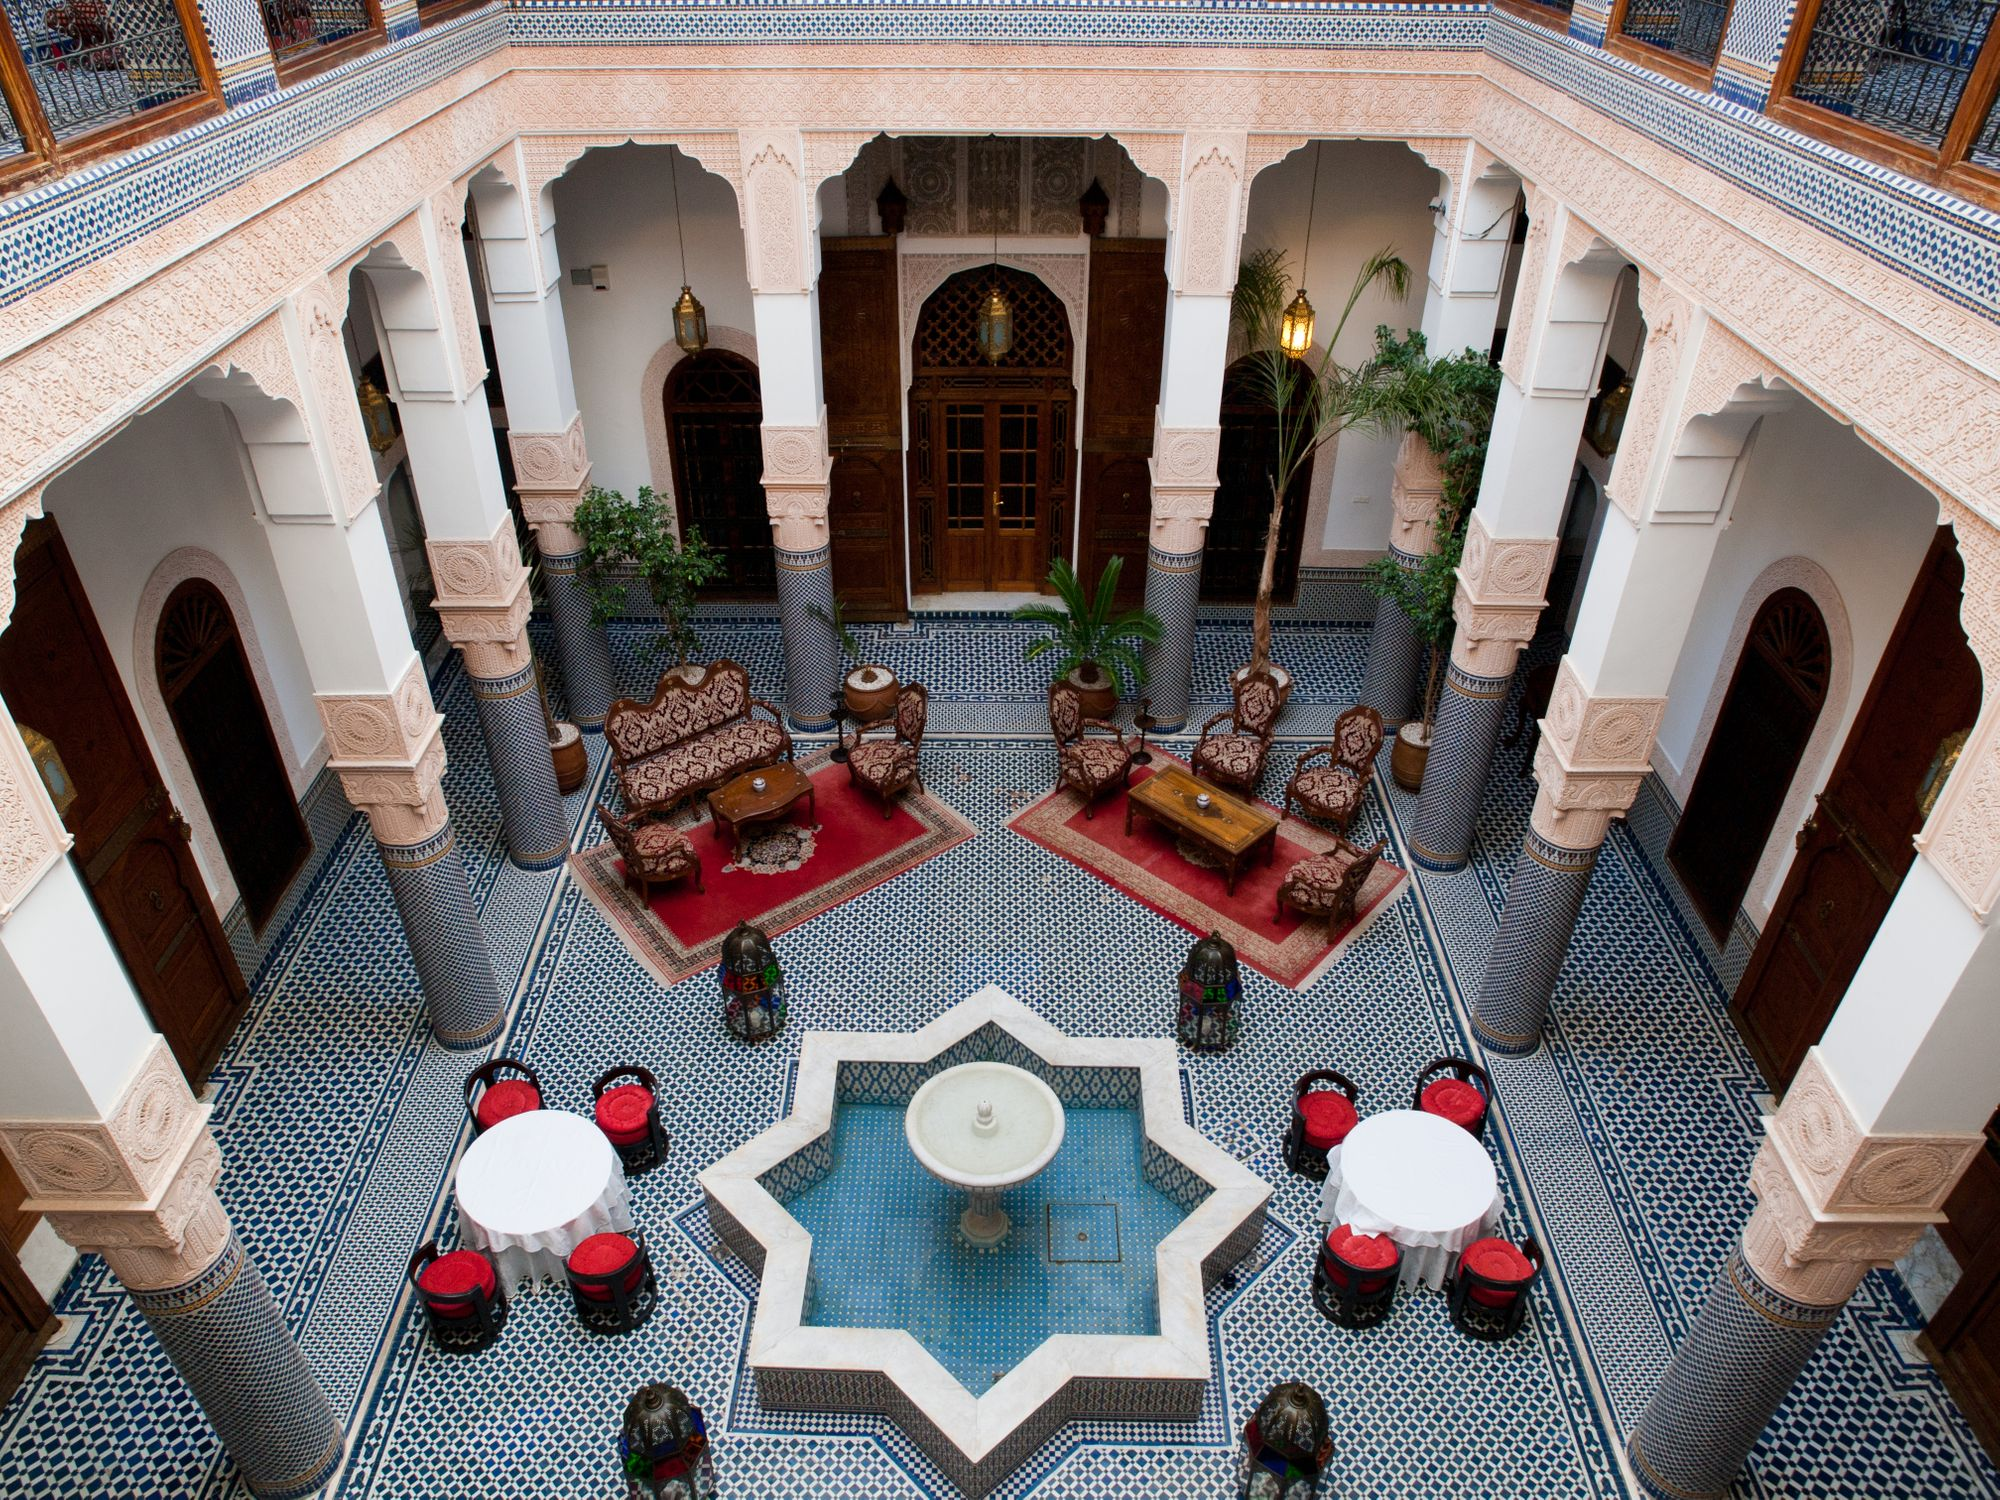 Вид на внутренний двор традиционного марокканского риада